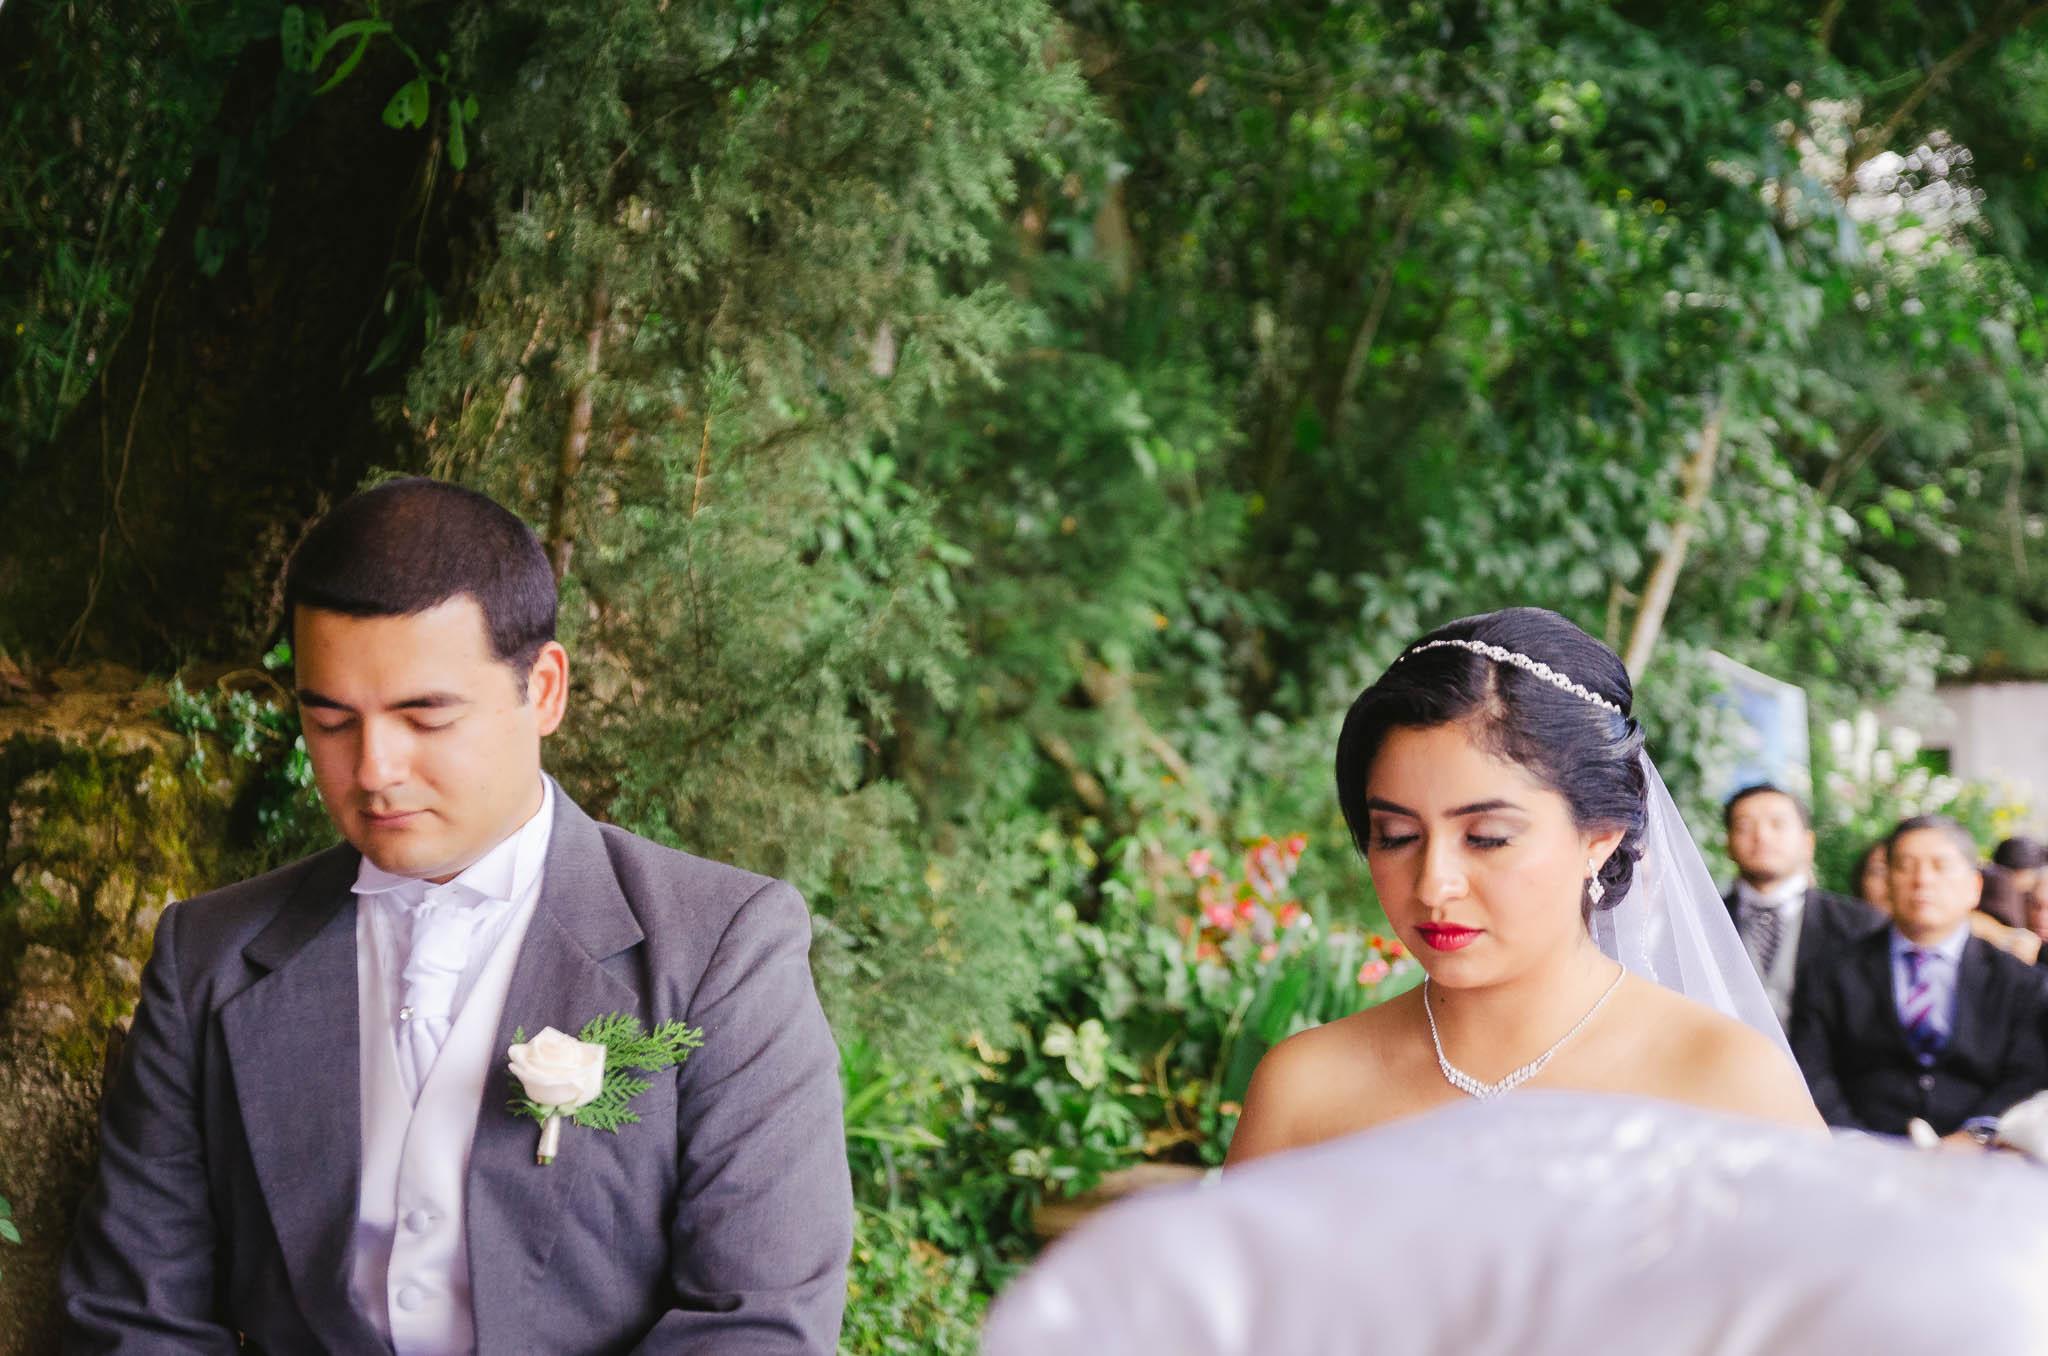 Wedding-Hotel_Casa_Miralvalle-Antigua_Guatemala-bodas-juan-salazar-fotografo-Guatemala-boda-juansalazarphoto-Antigua_Guatemala